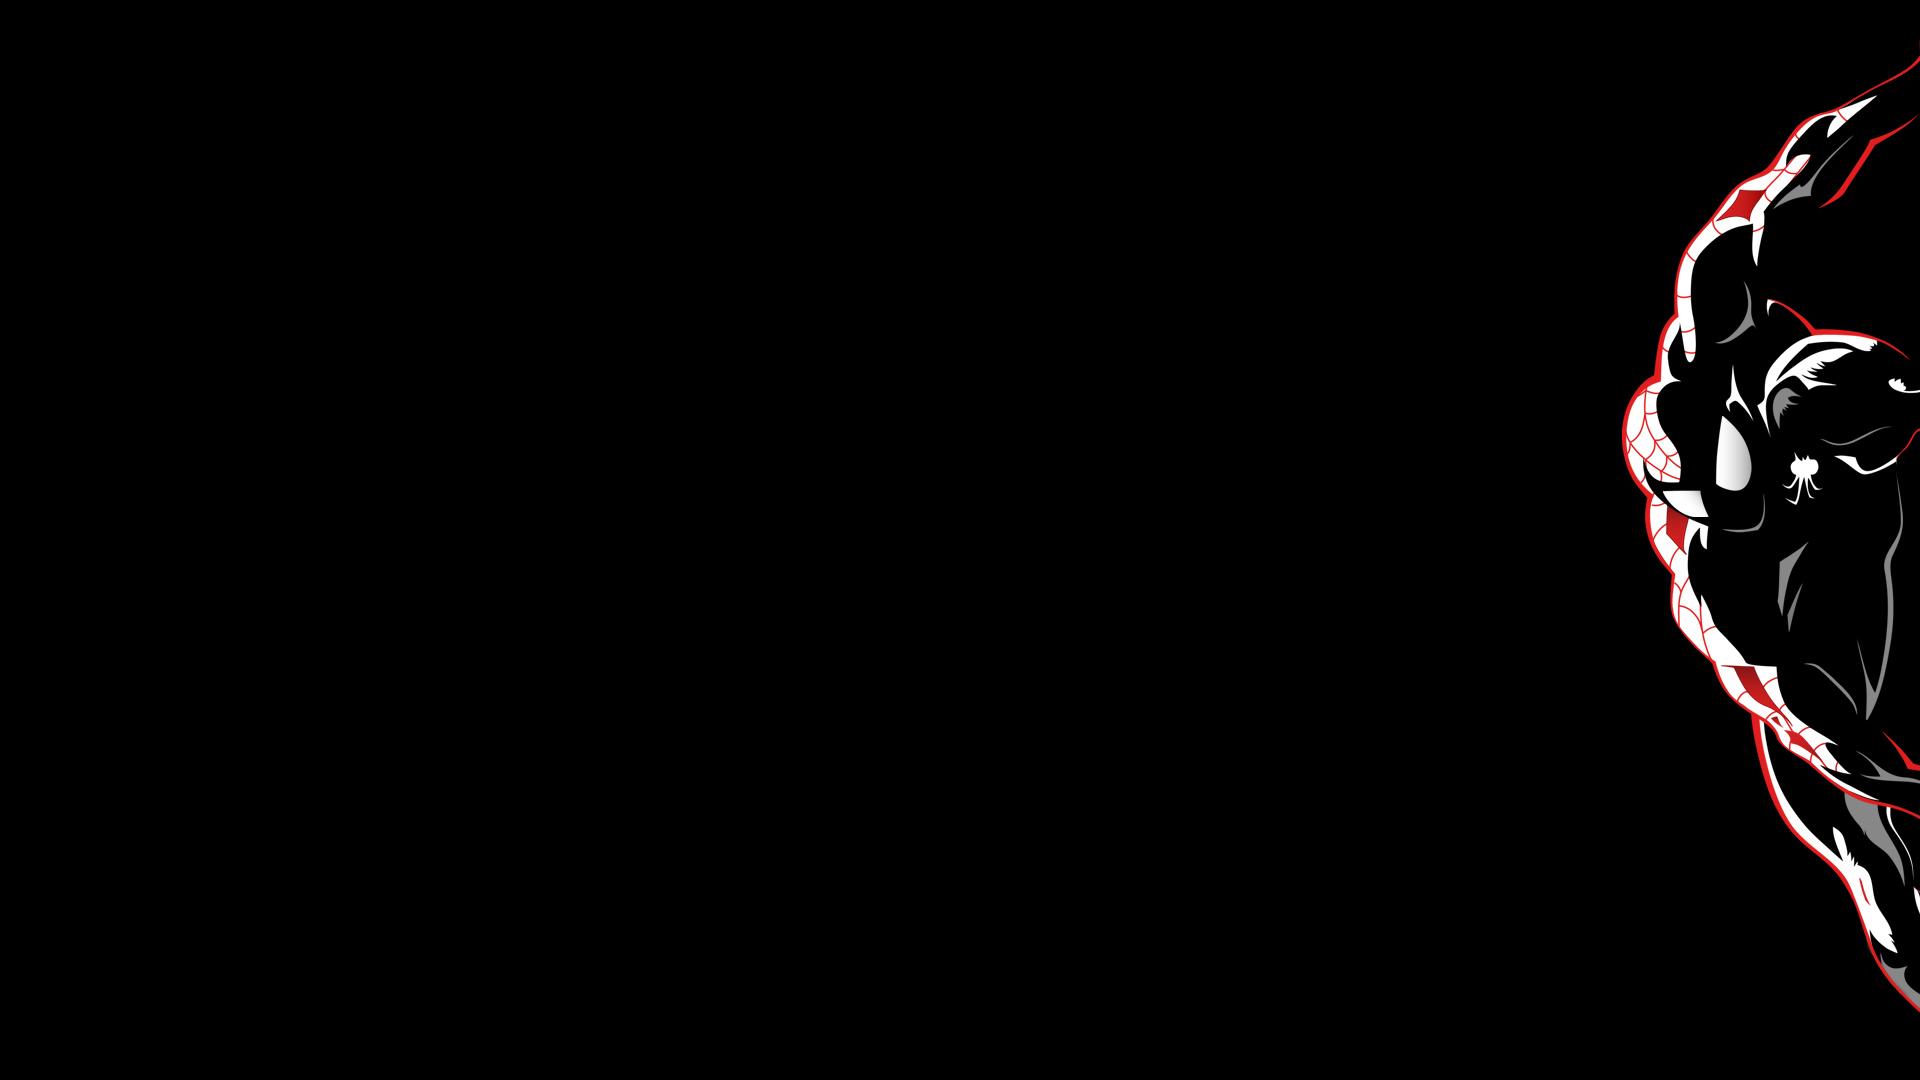 marvel logo wallpaper 1920x1080 - photo #32